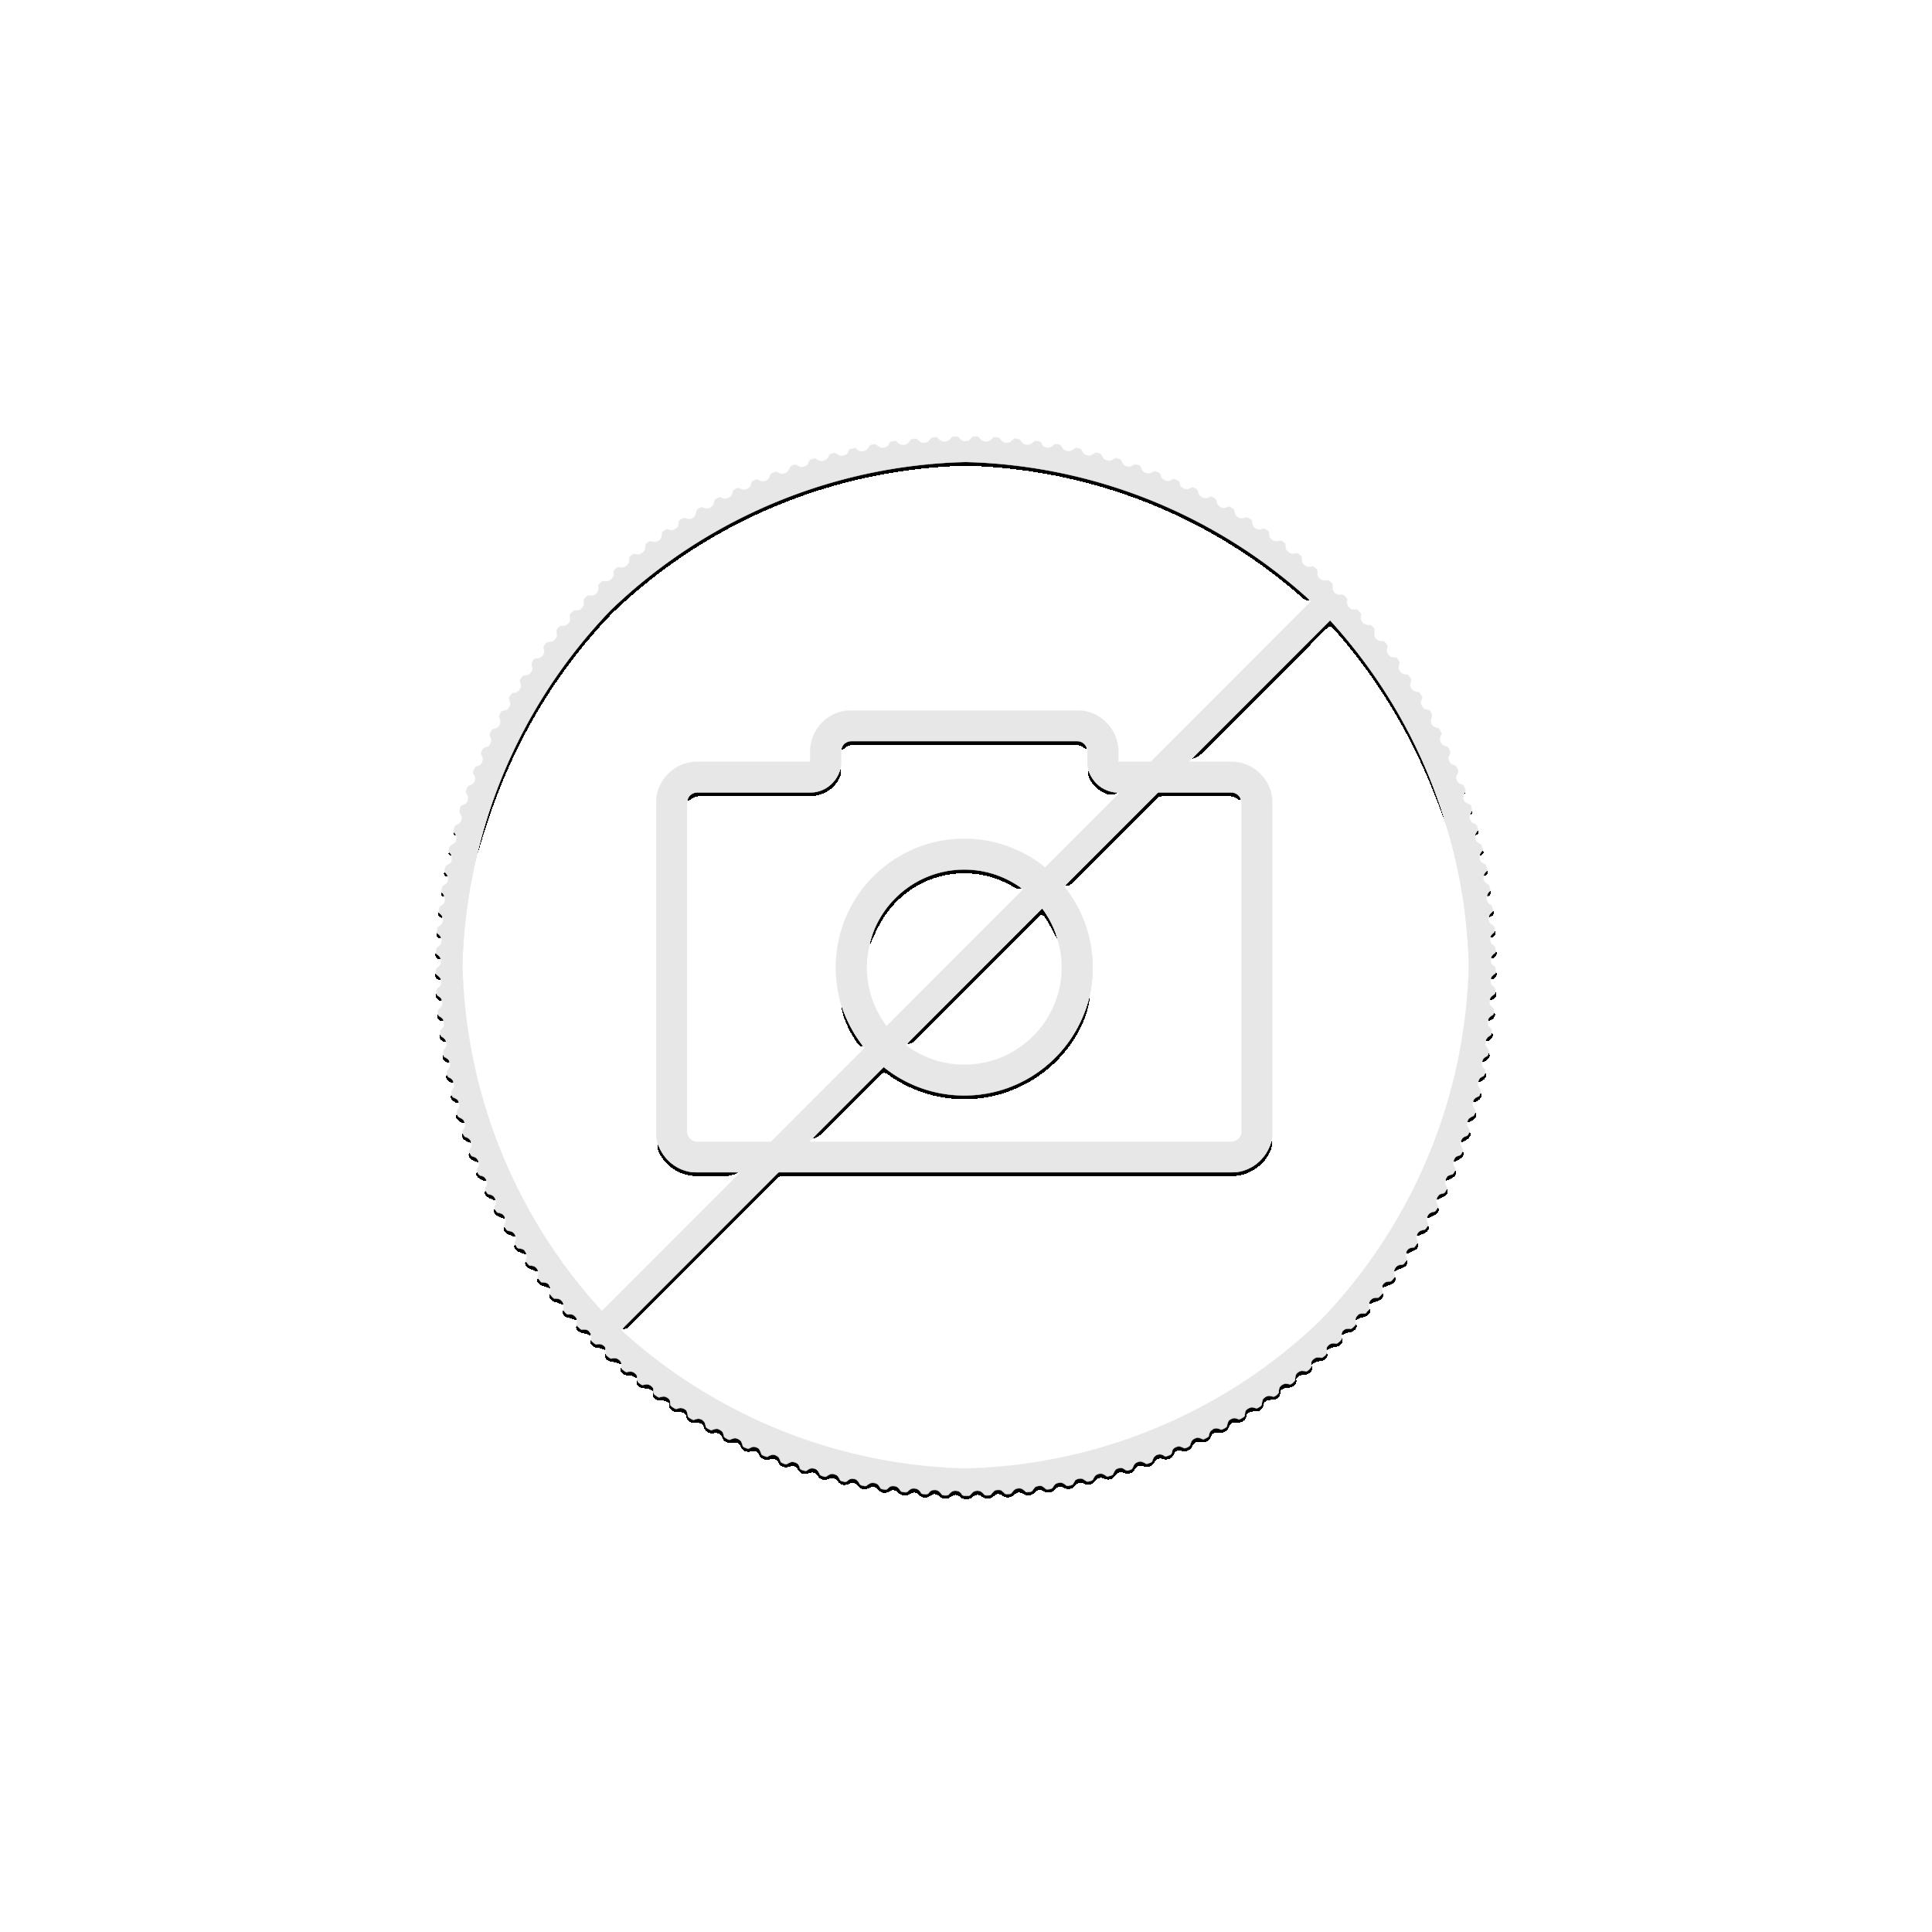 1 kilogram silver Lunar coin 2018 Year of the Dog